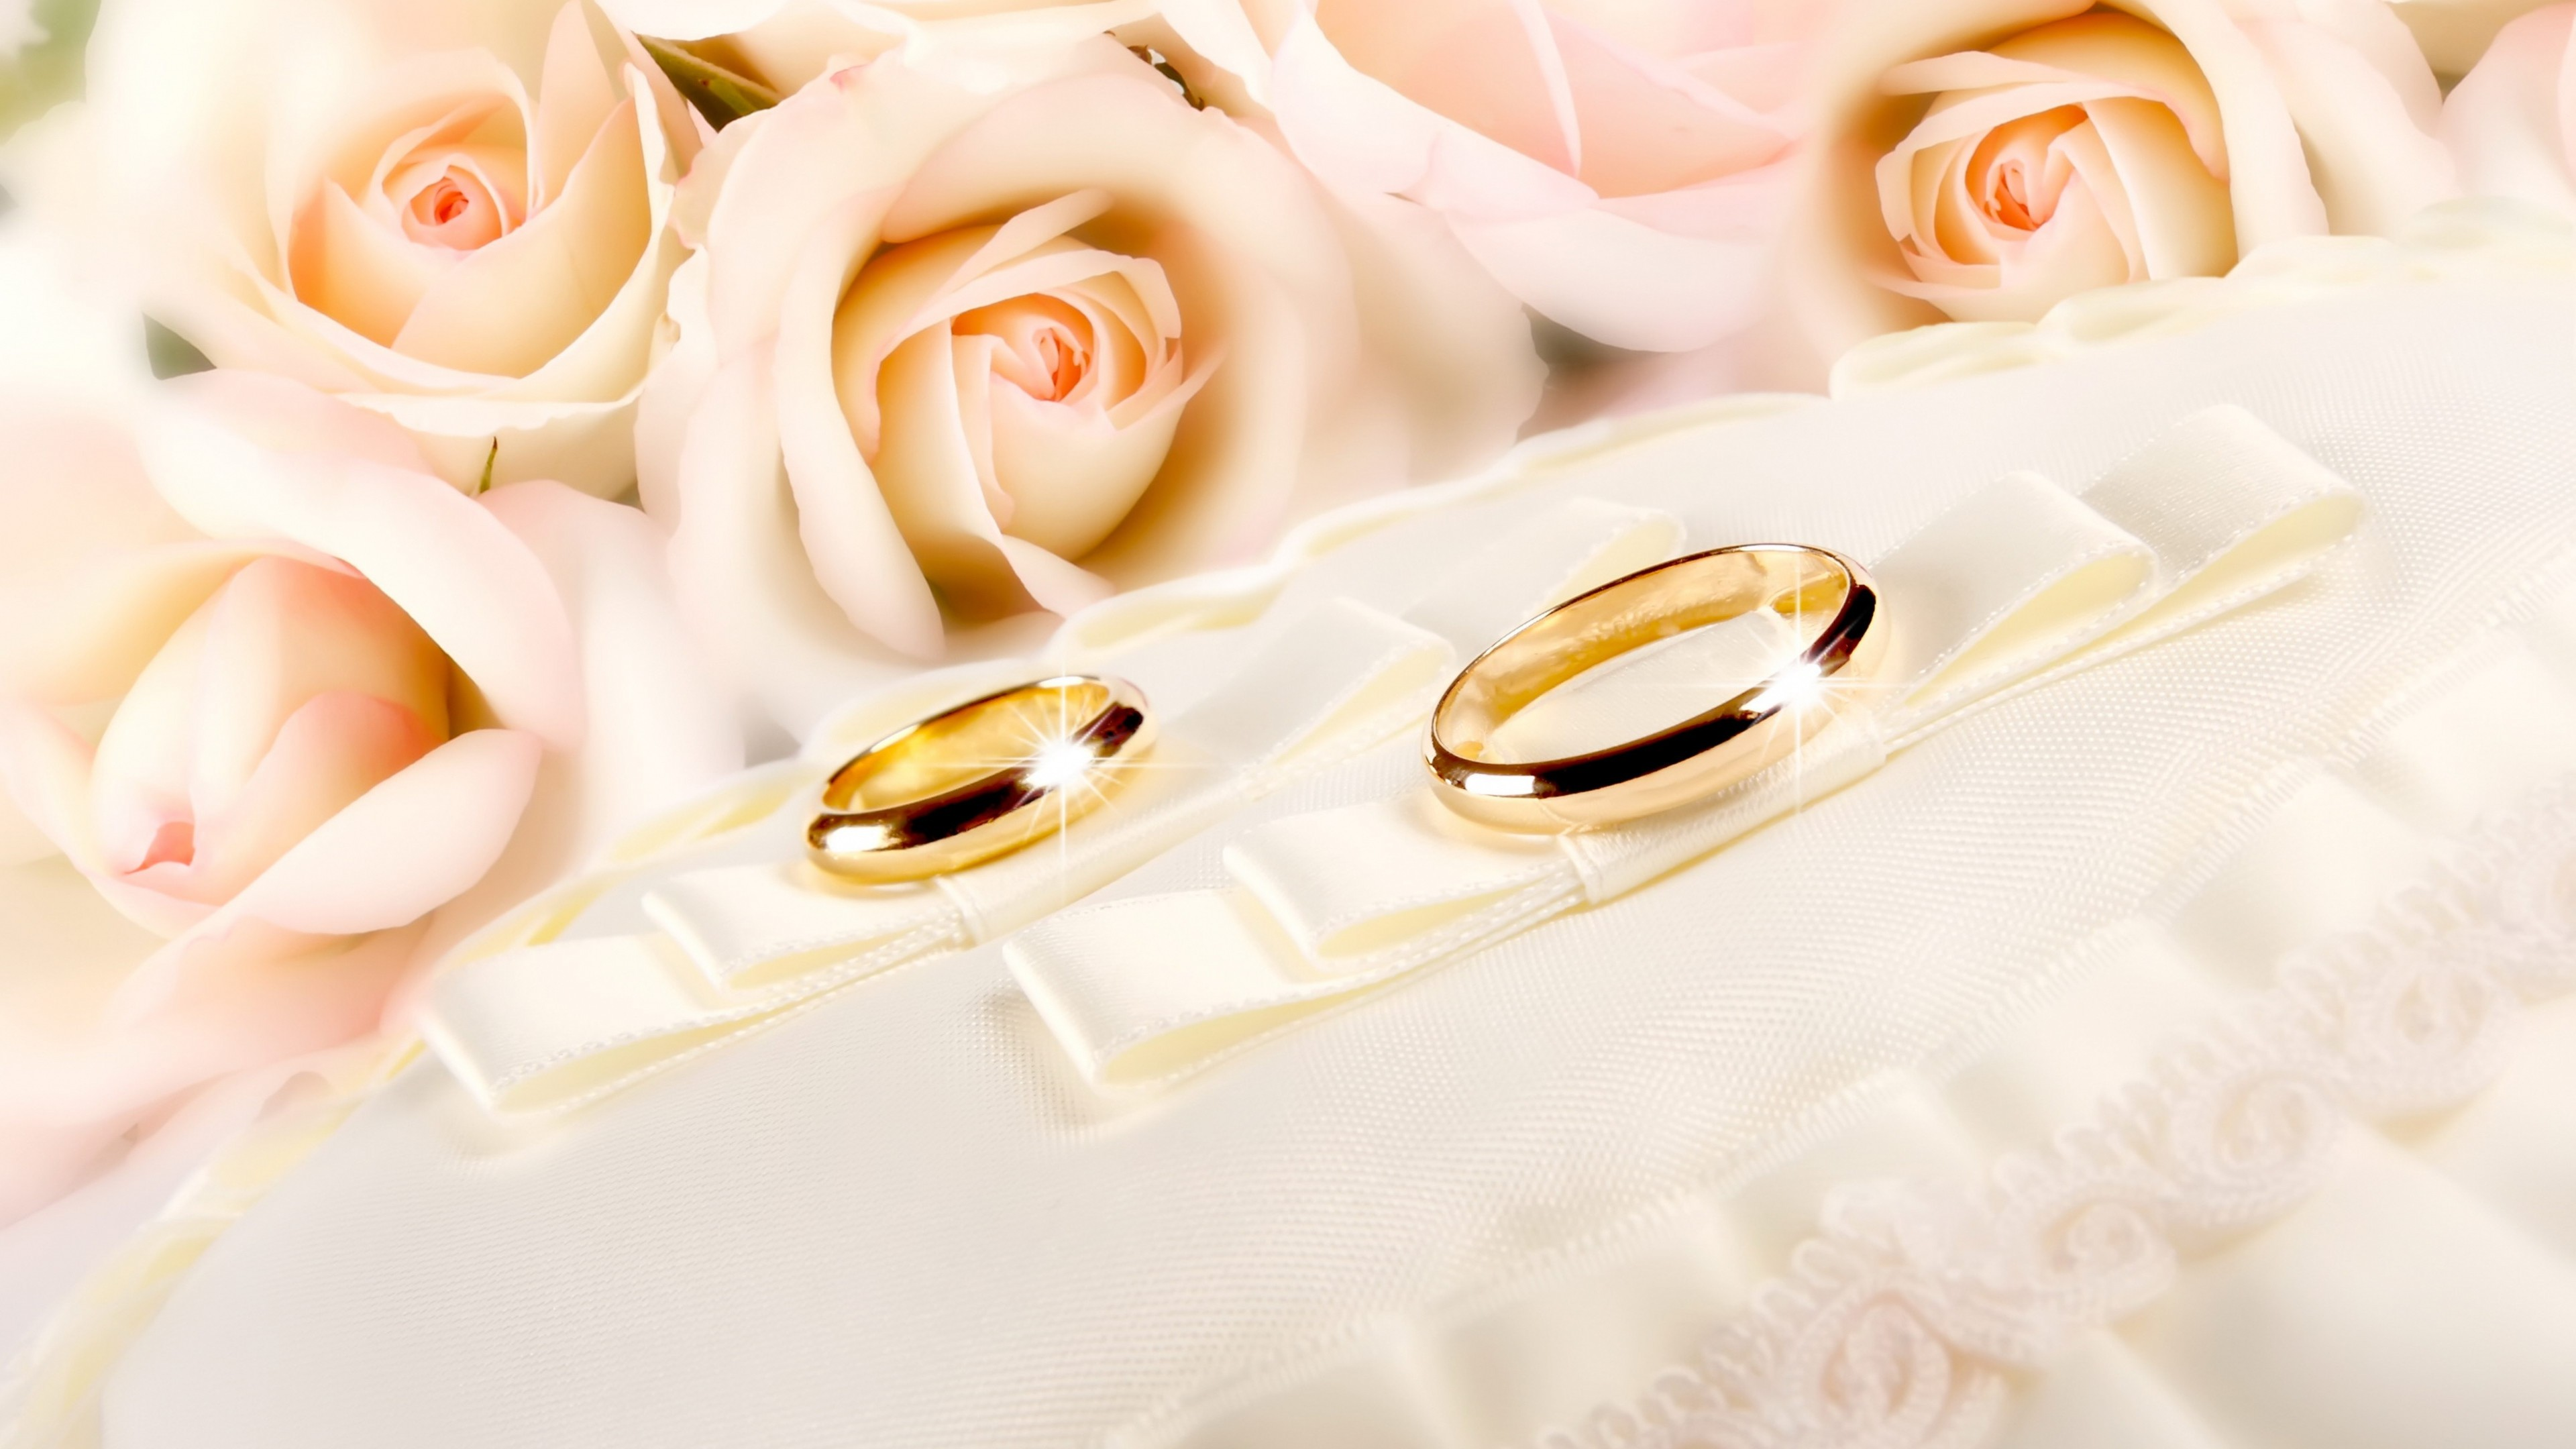 Rings-wedding-gold-glitter-fabric-flower-rose-backgrounds